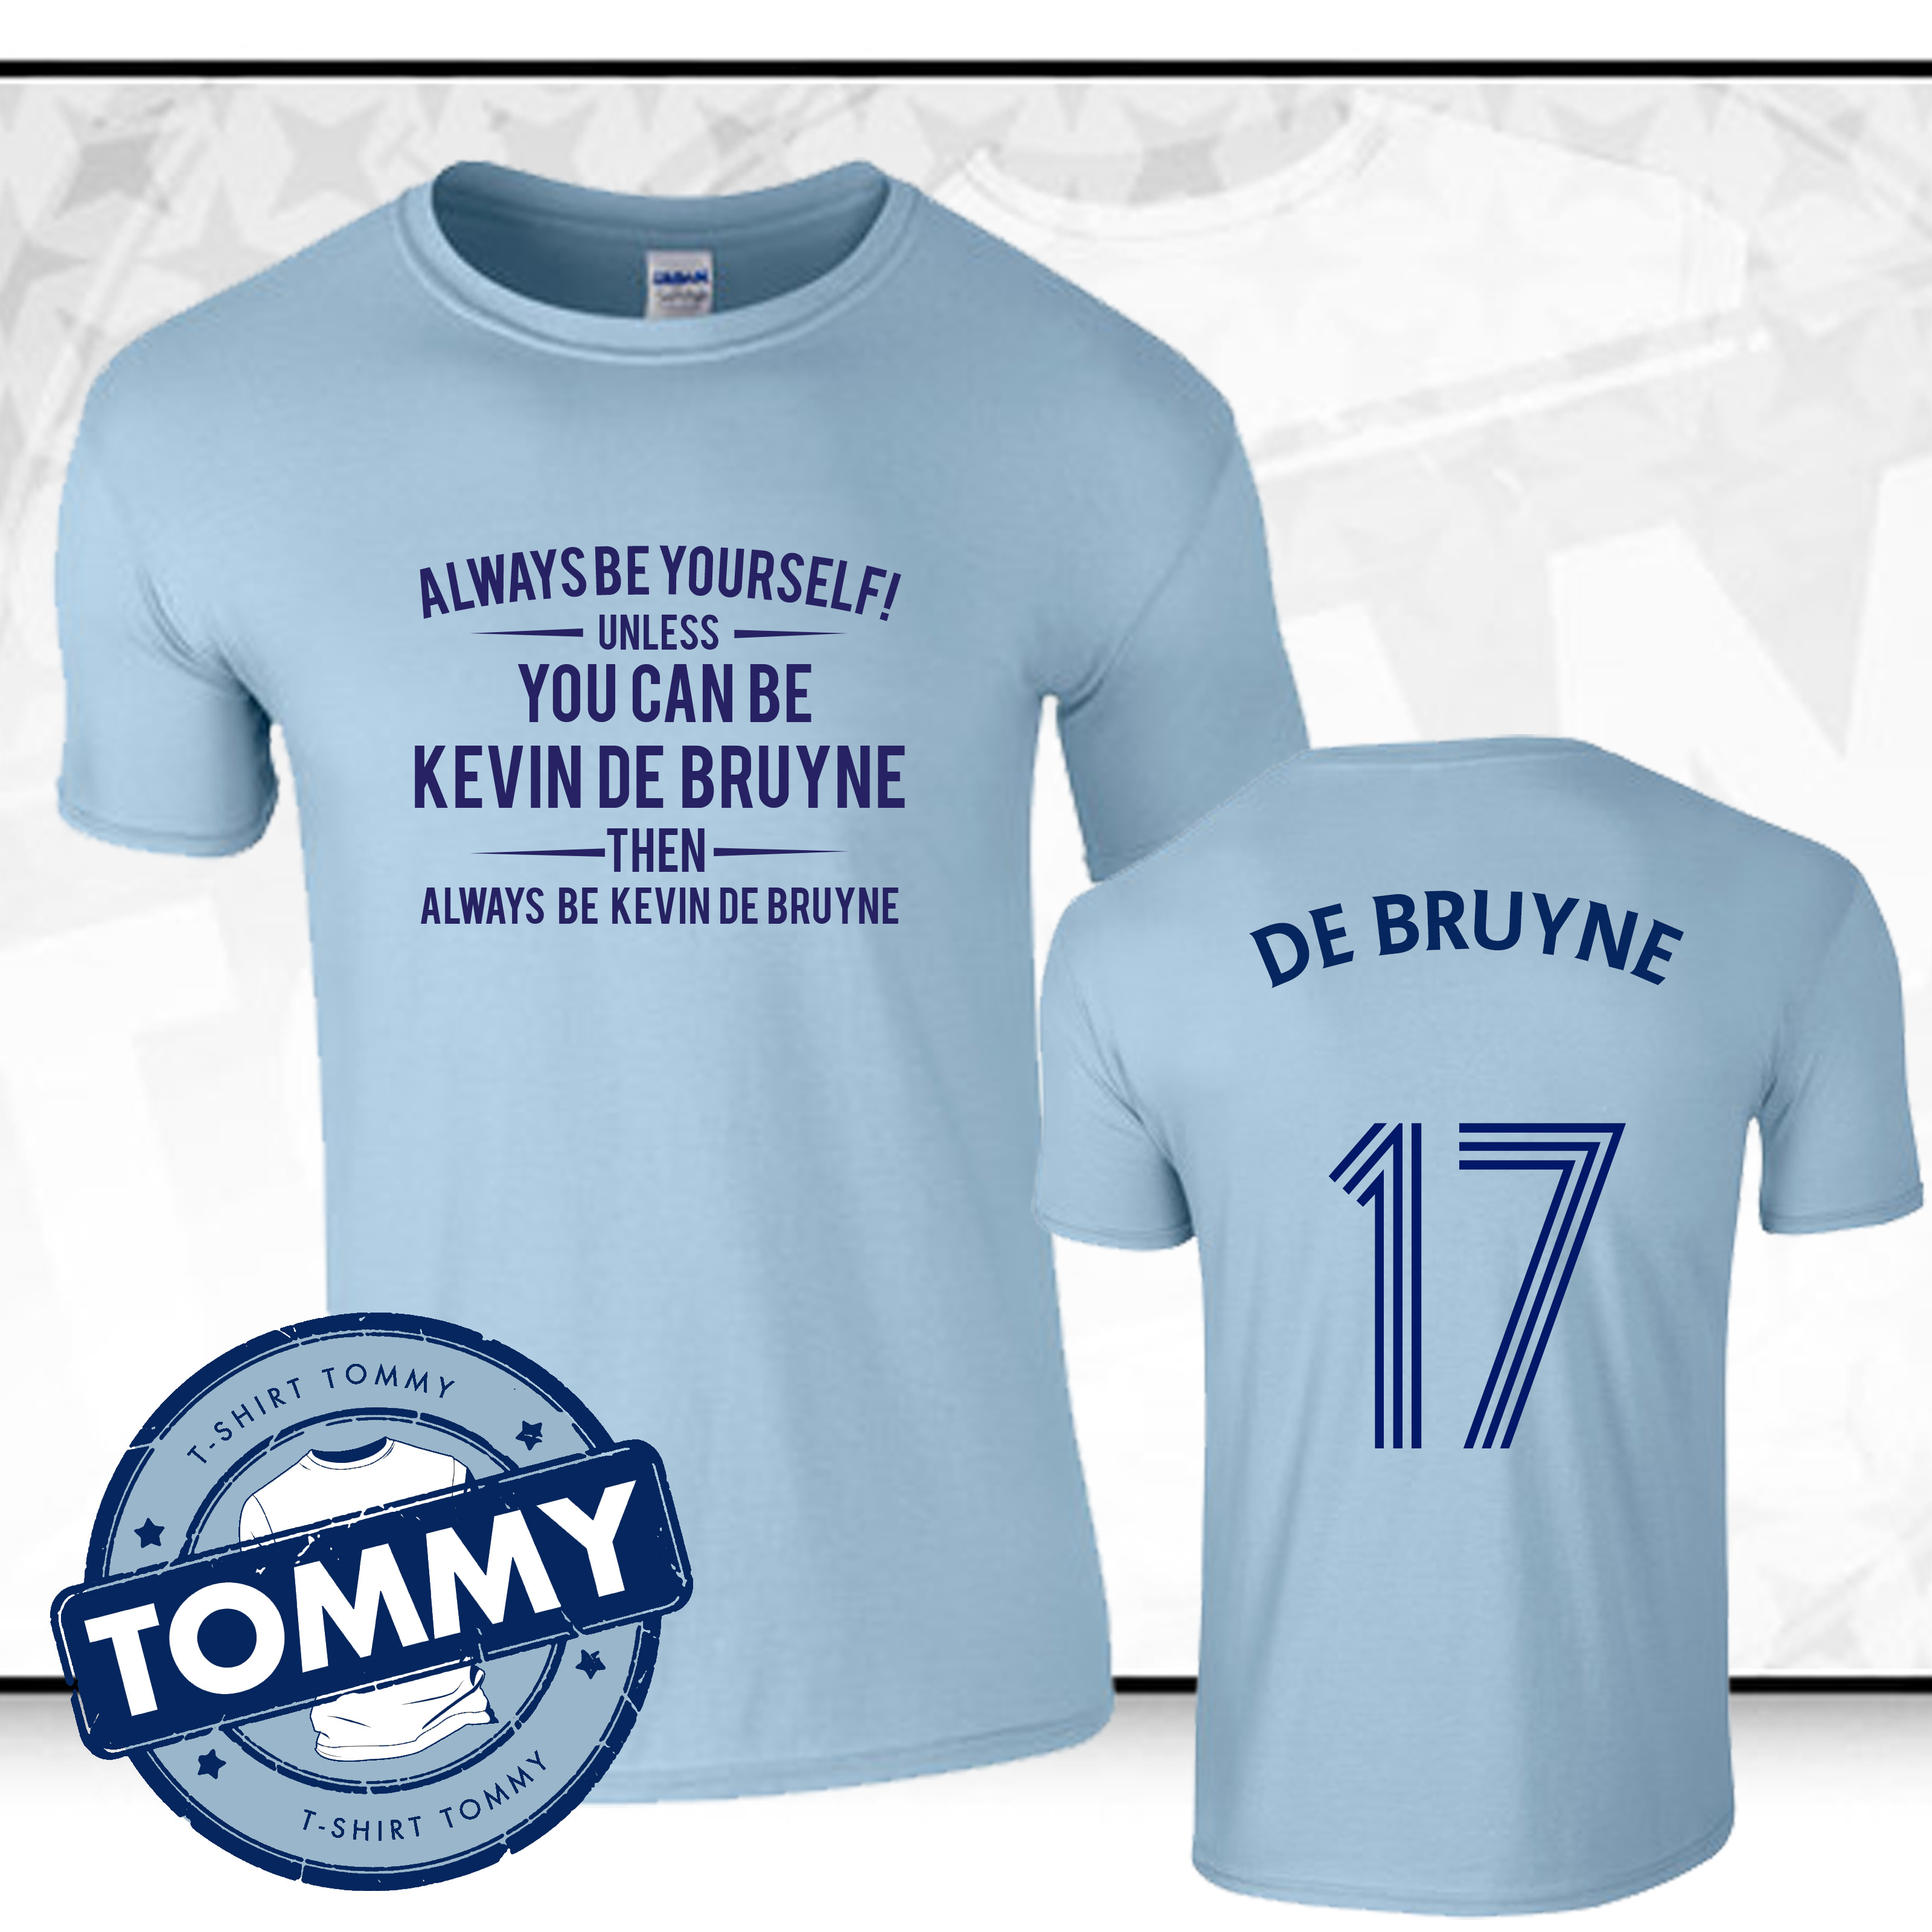 the best attitude 08ffa a3802 Details about Man City Always Be... Kevin De Bruyne T-Shirt De Bruyne Man  City Football TShirt